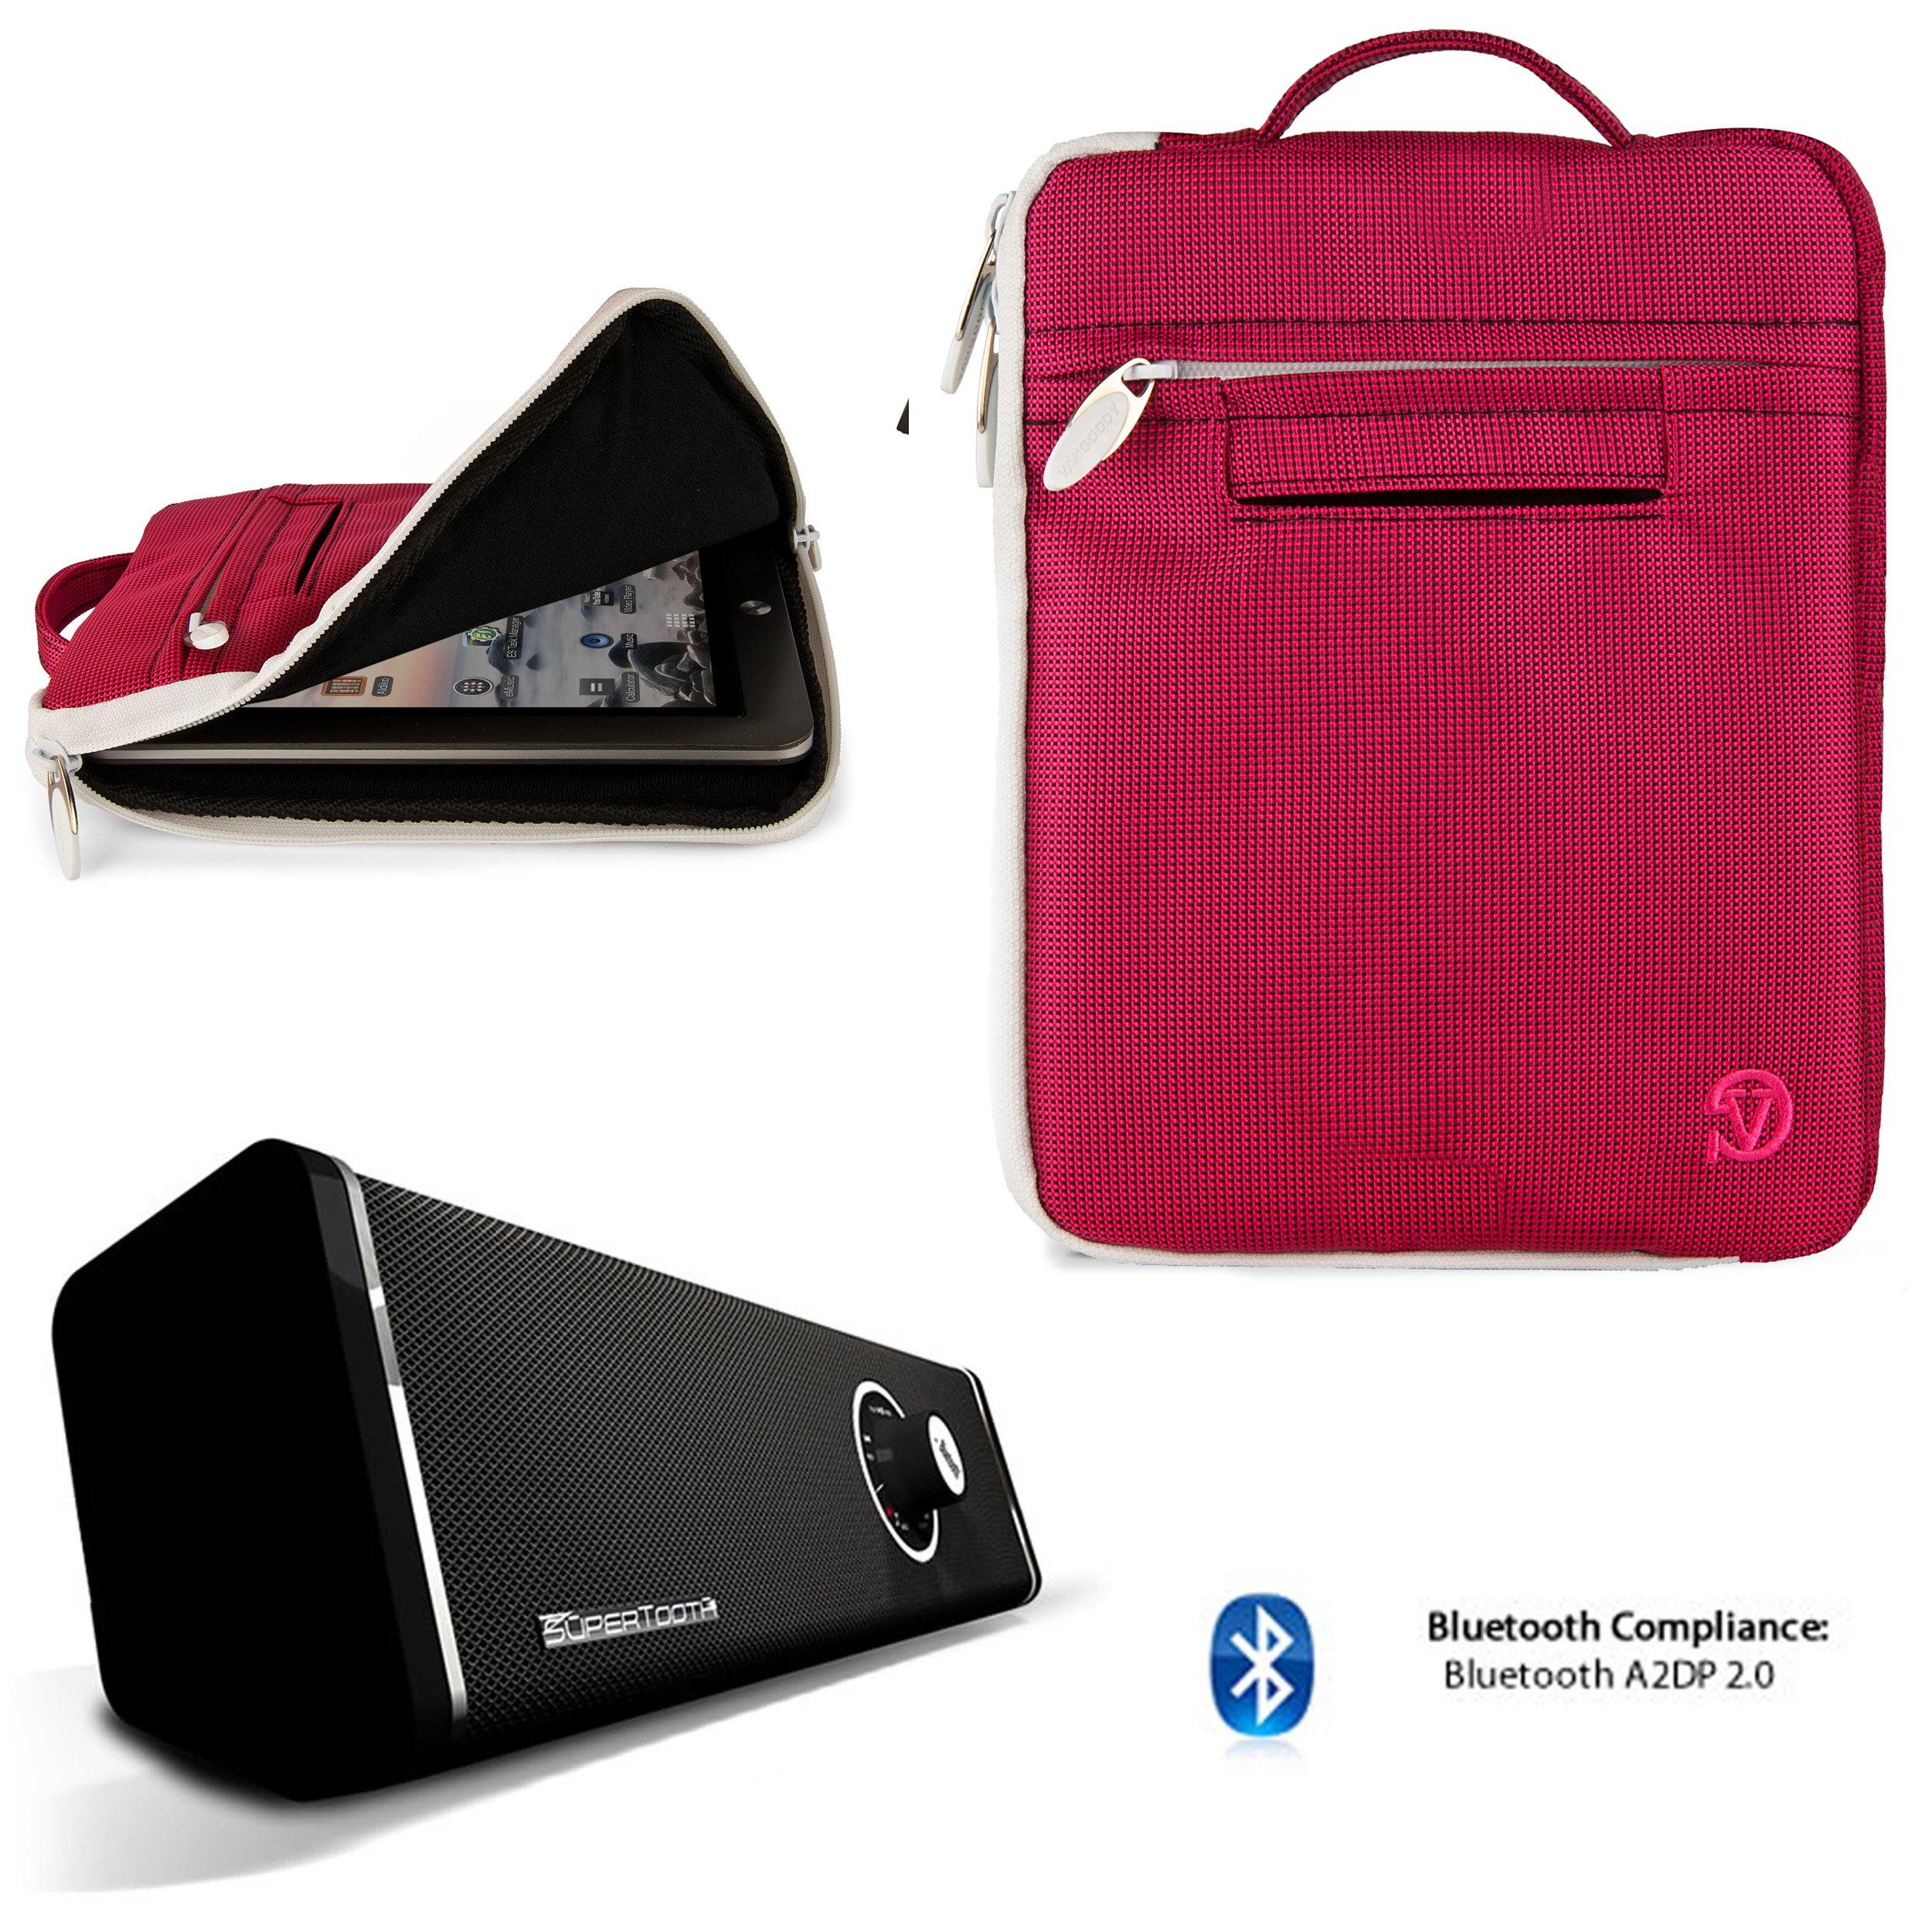 Hydei Travel Nylon Padded Sleeve For Asus Nexus 7 (2013 & 2012) AT&T T-Mobile Verizon Unlocked + Bluetooth Speaker